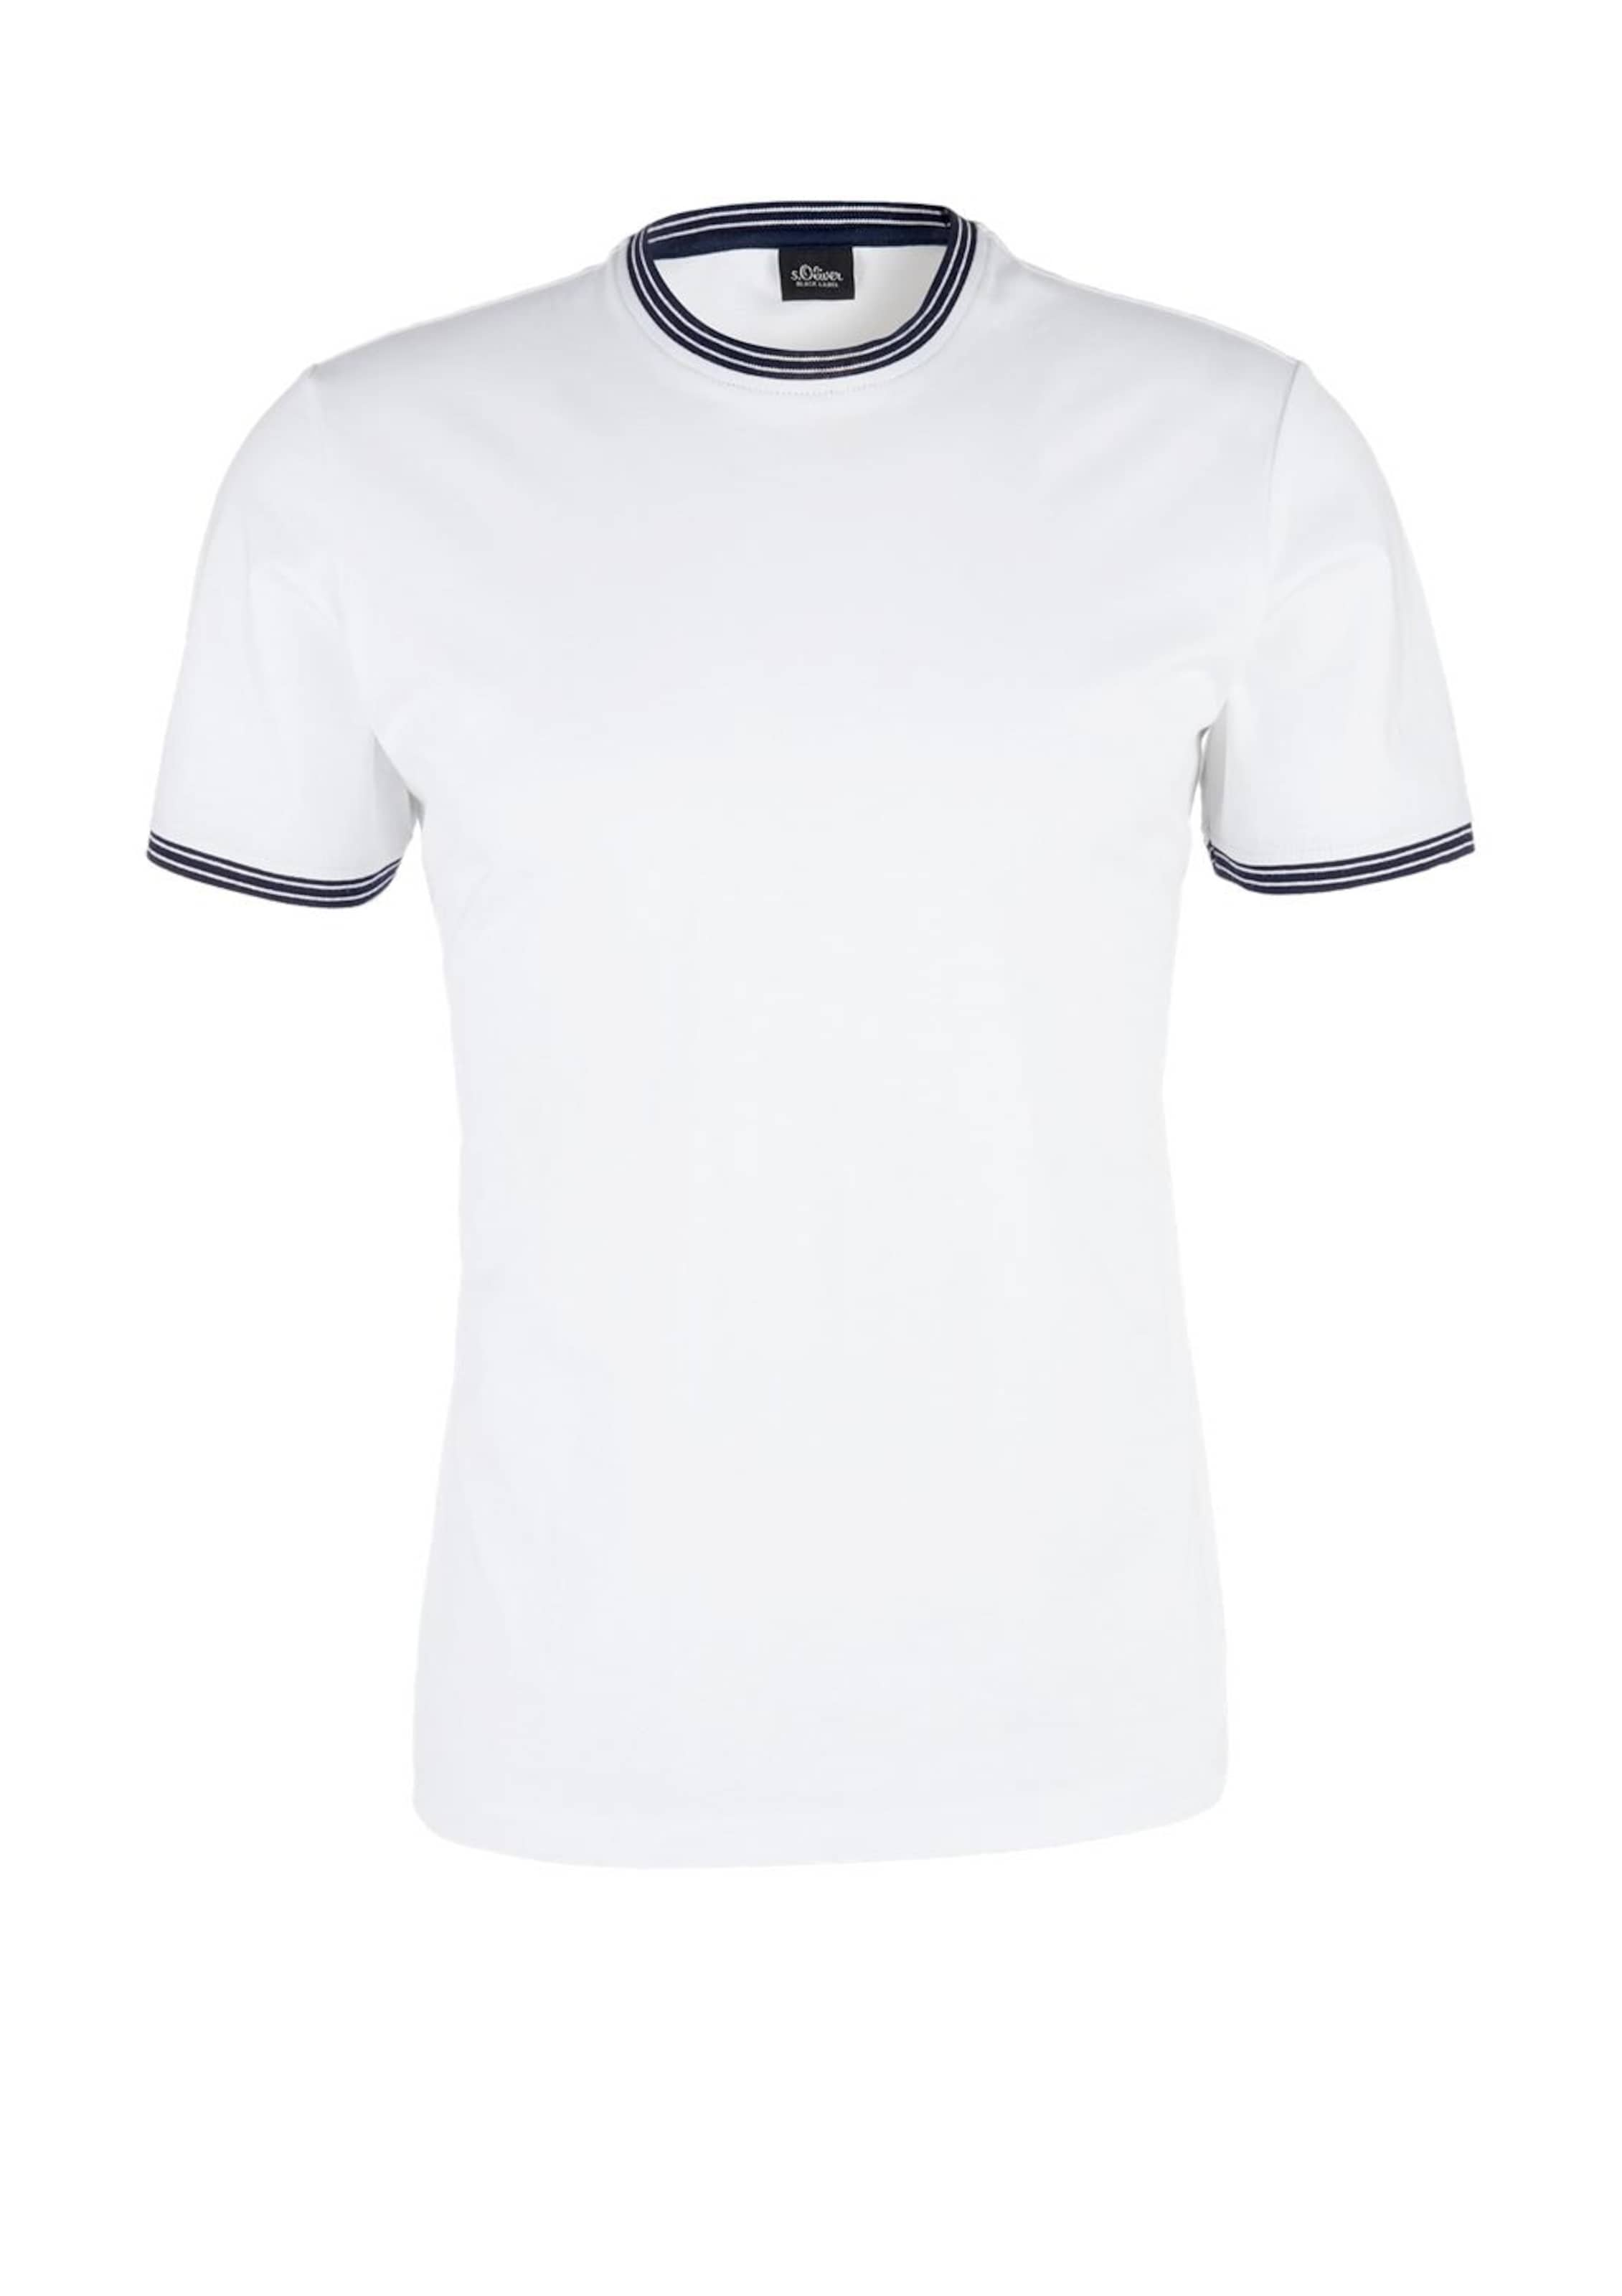 Shirt Black SchwarzWeiß oliver S Label In y80mnwNOvP